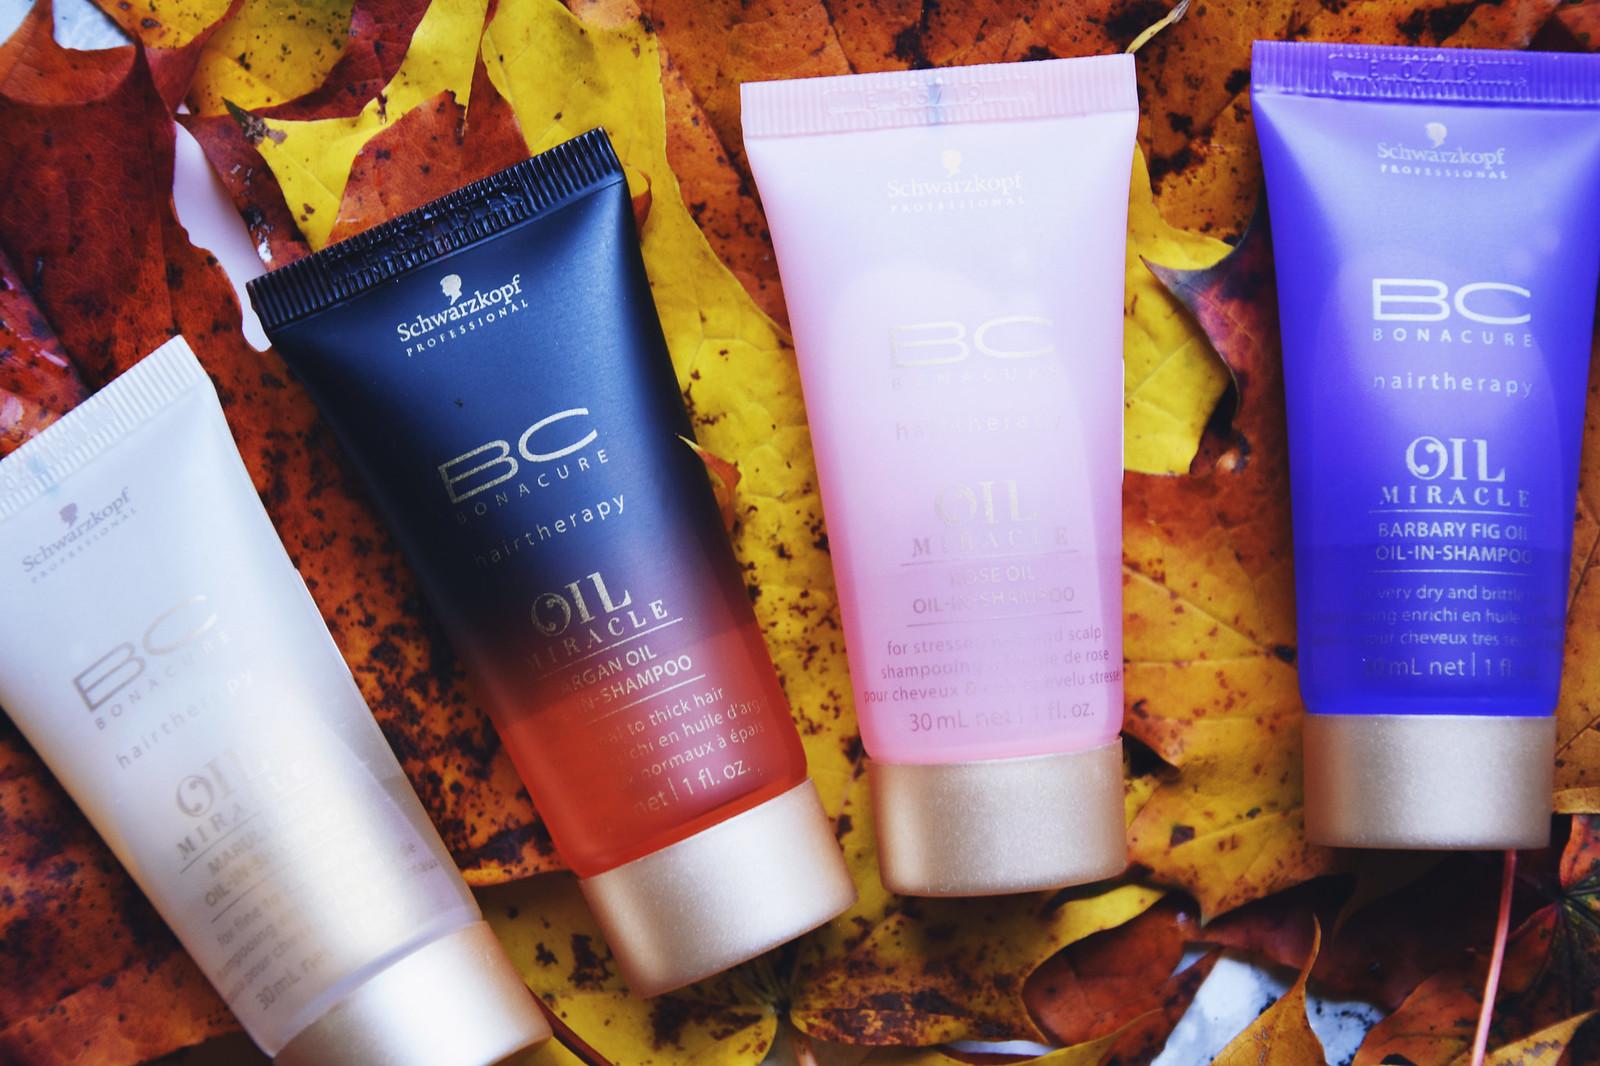 Schwarzkopf oil hairtherapy shampoo review